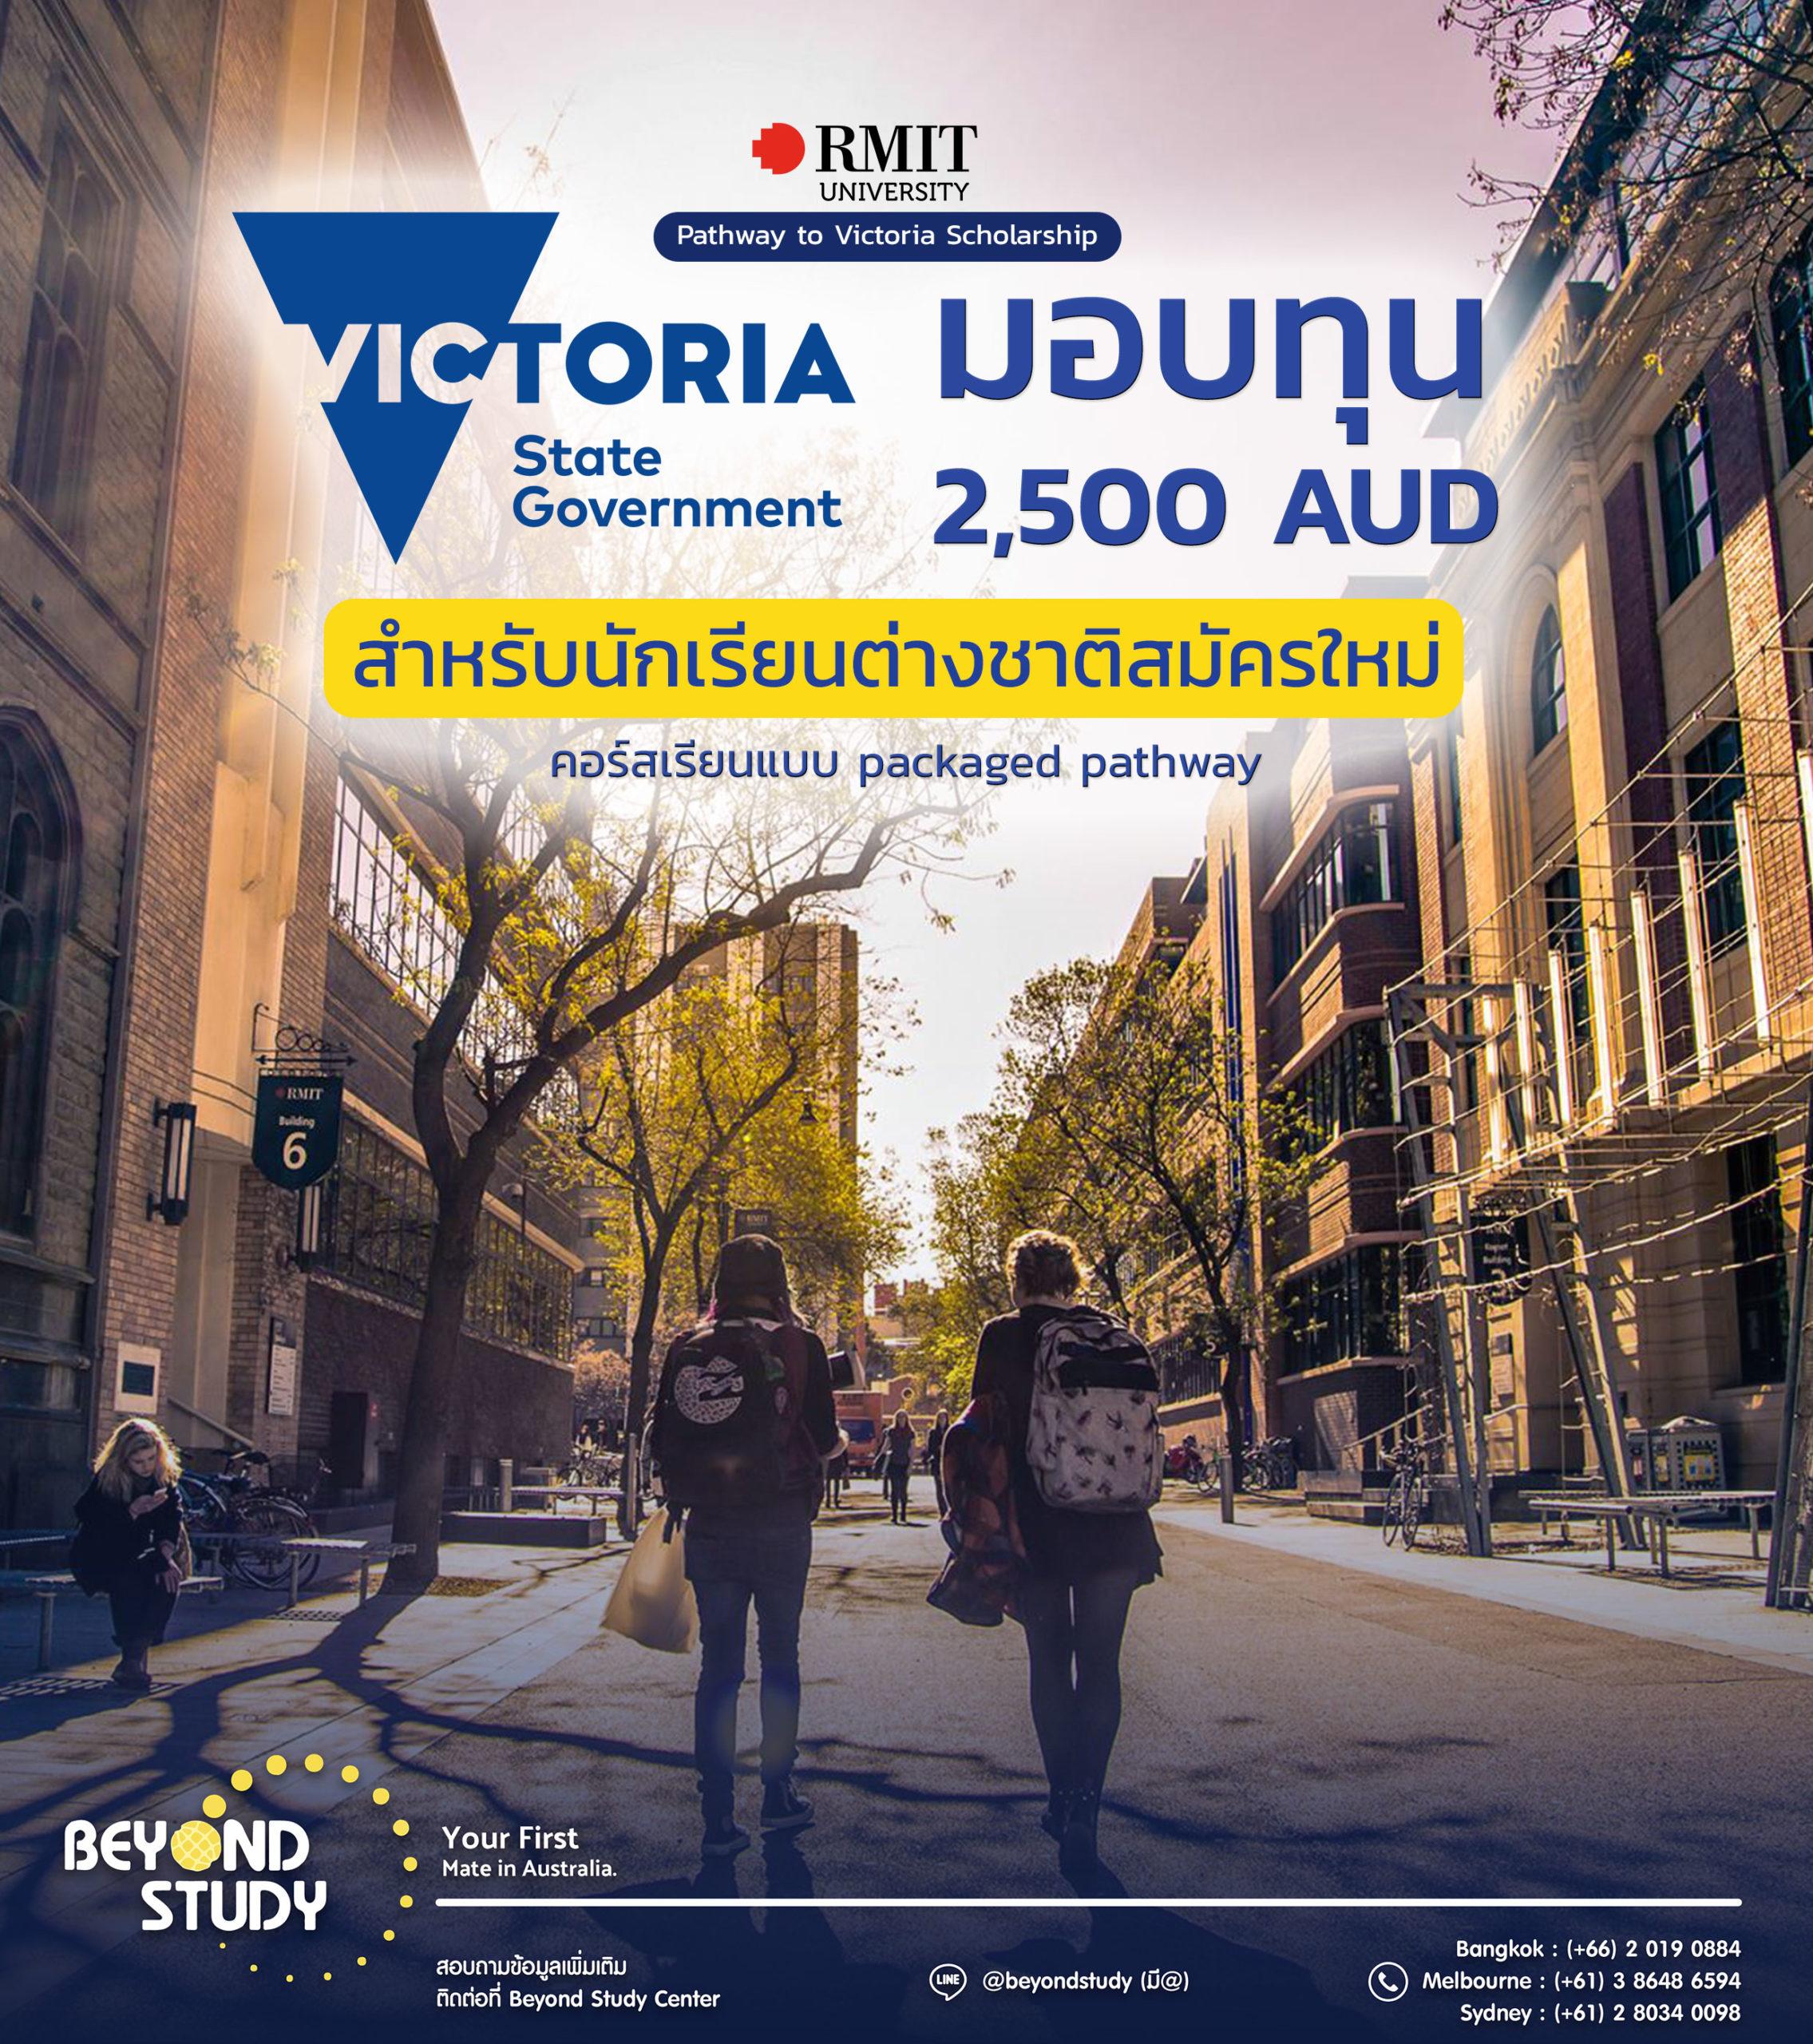 Pathway to Victoria Scholarship